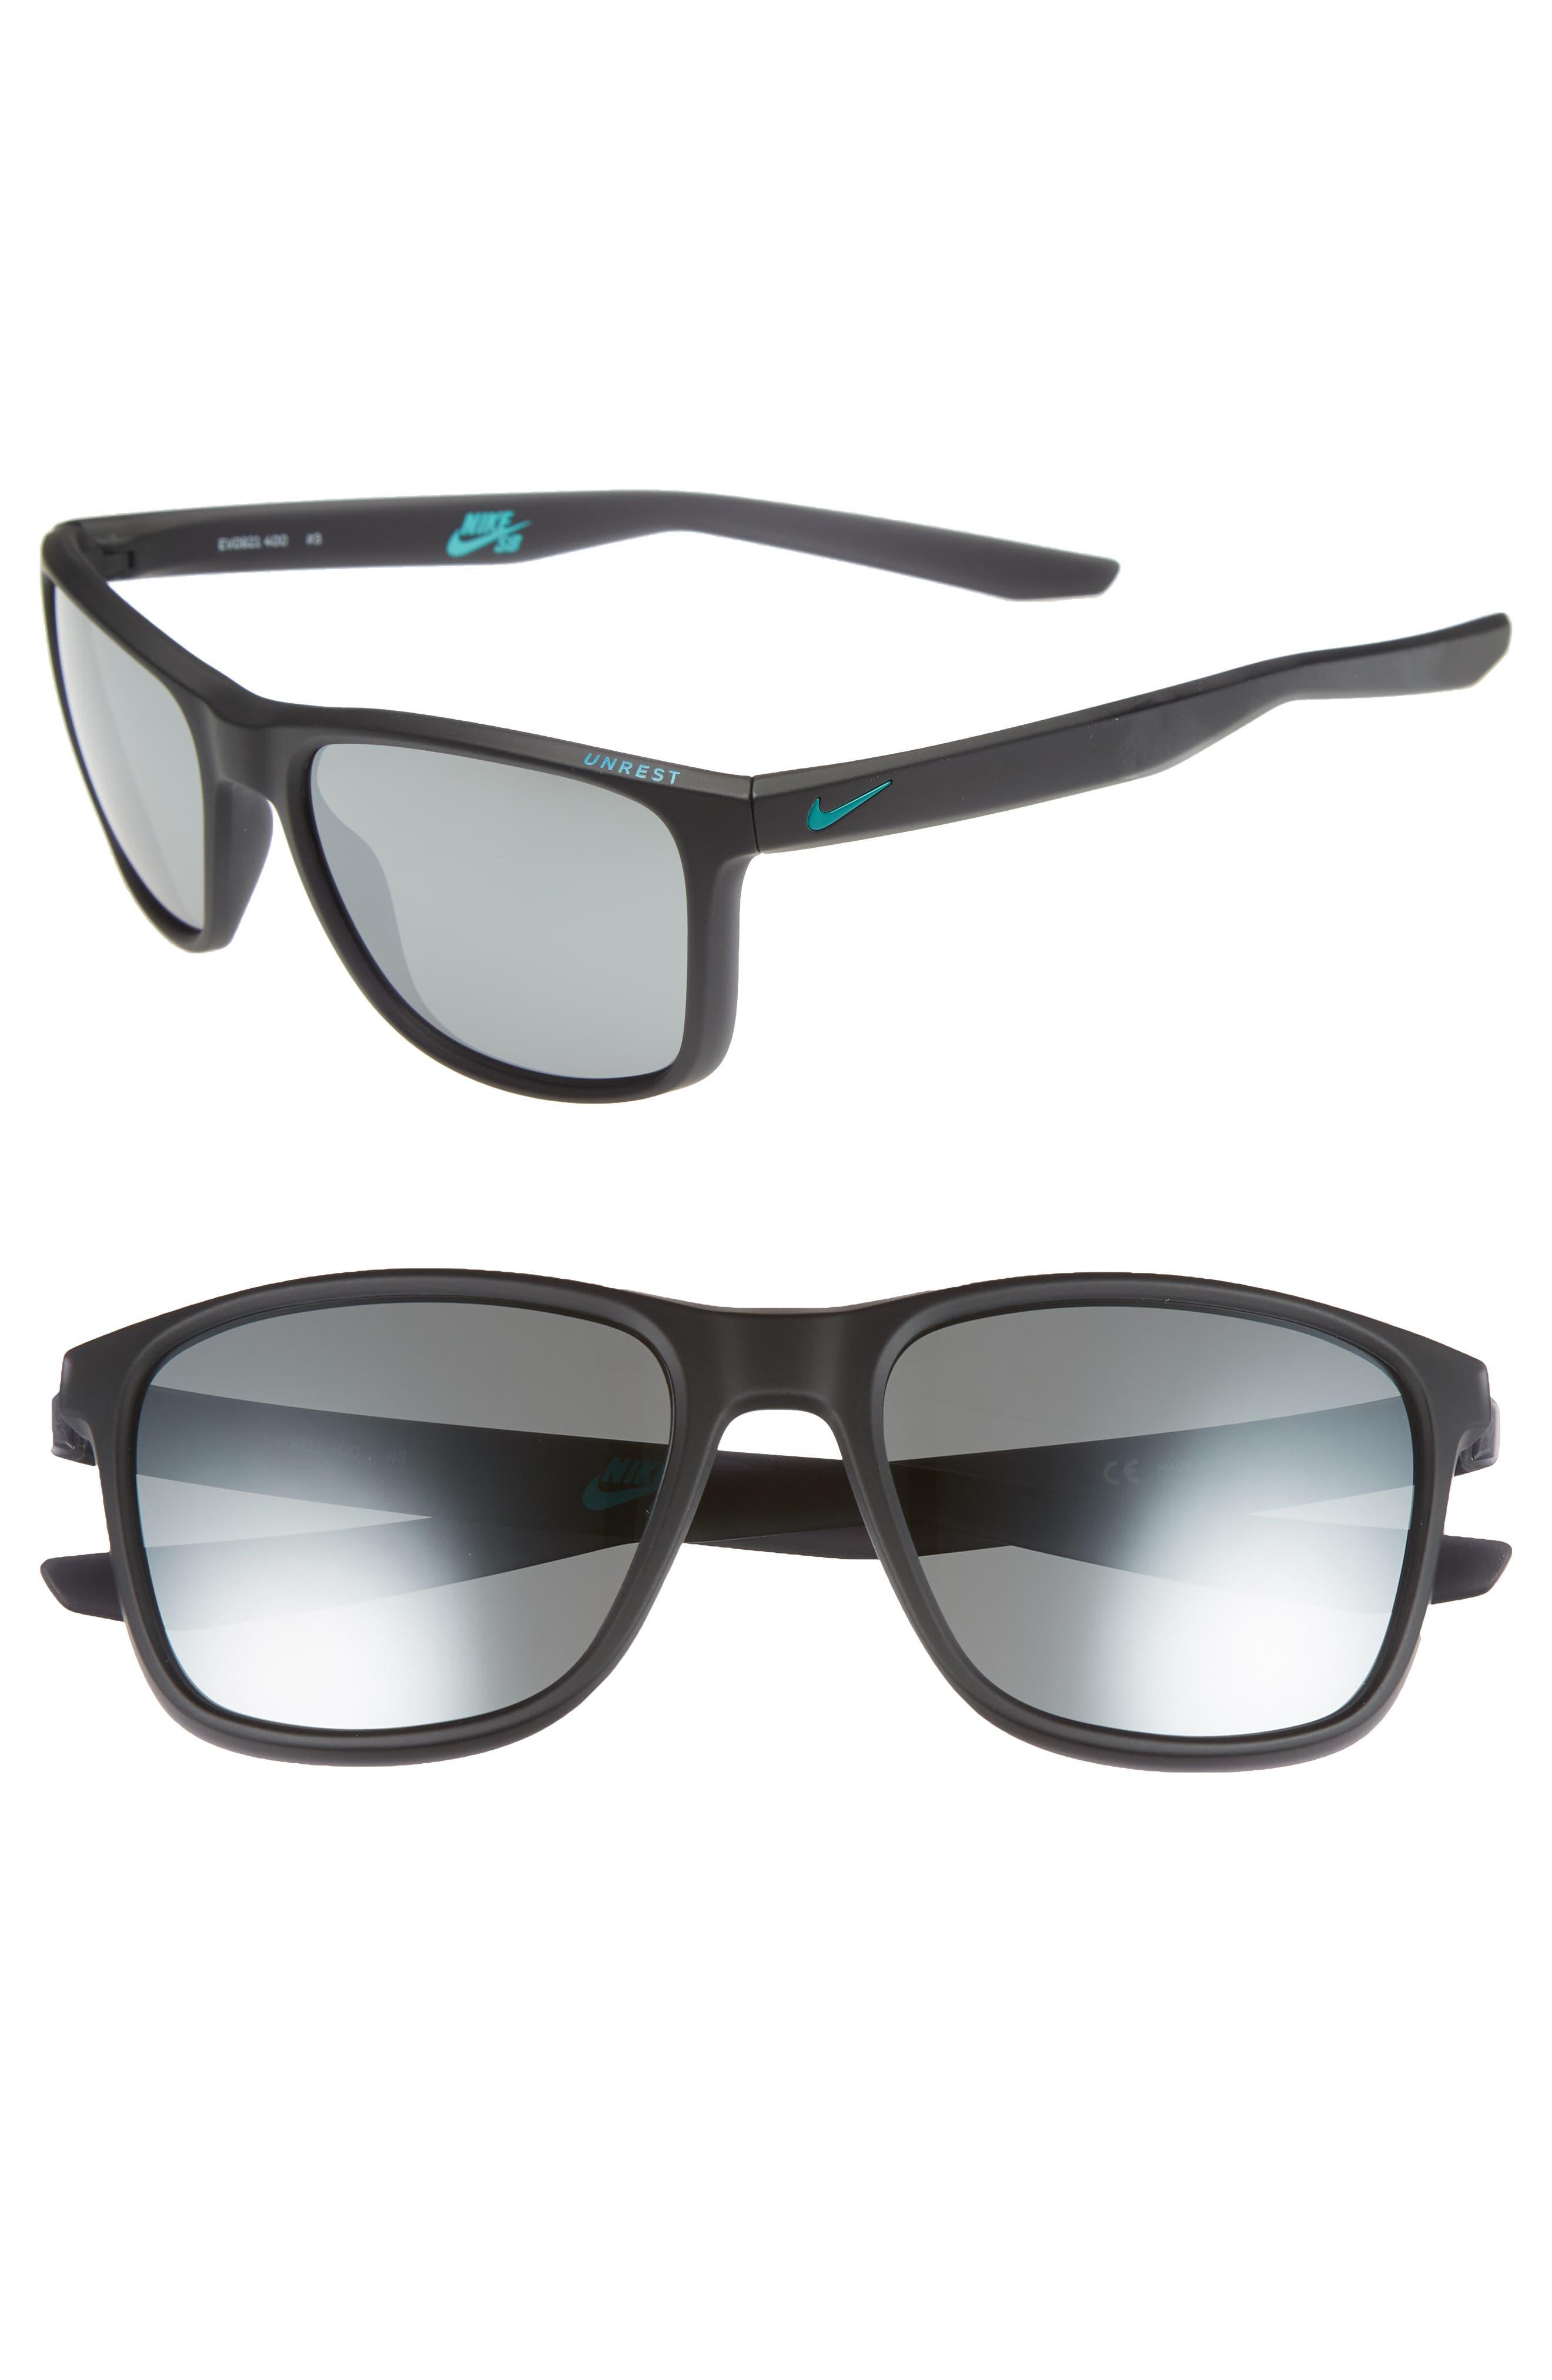 NIKE Unrest 57mm Sunglasses, Main, color, MATTE OBSIDIAN/ GREY SILVER